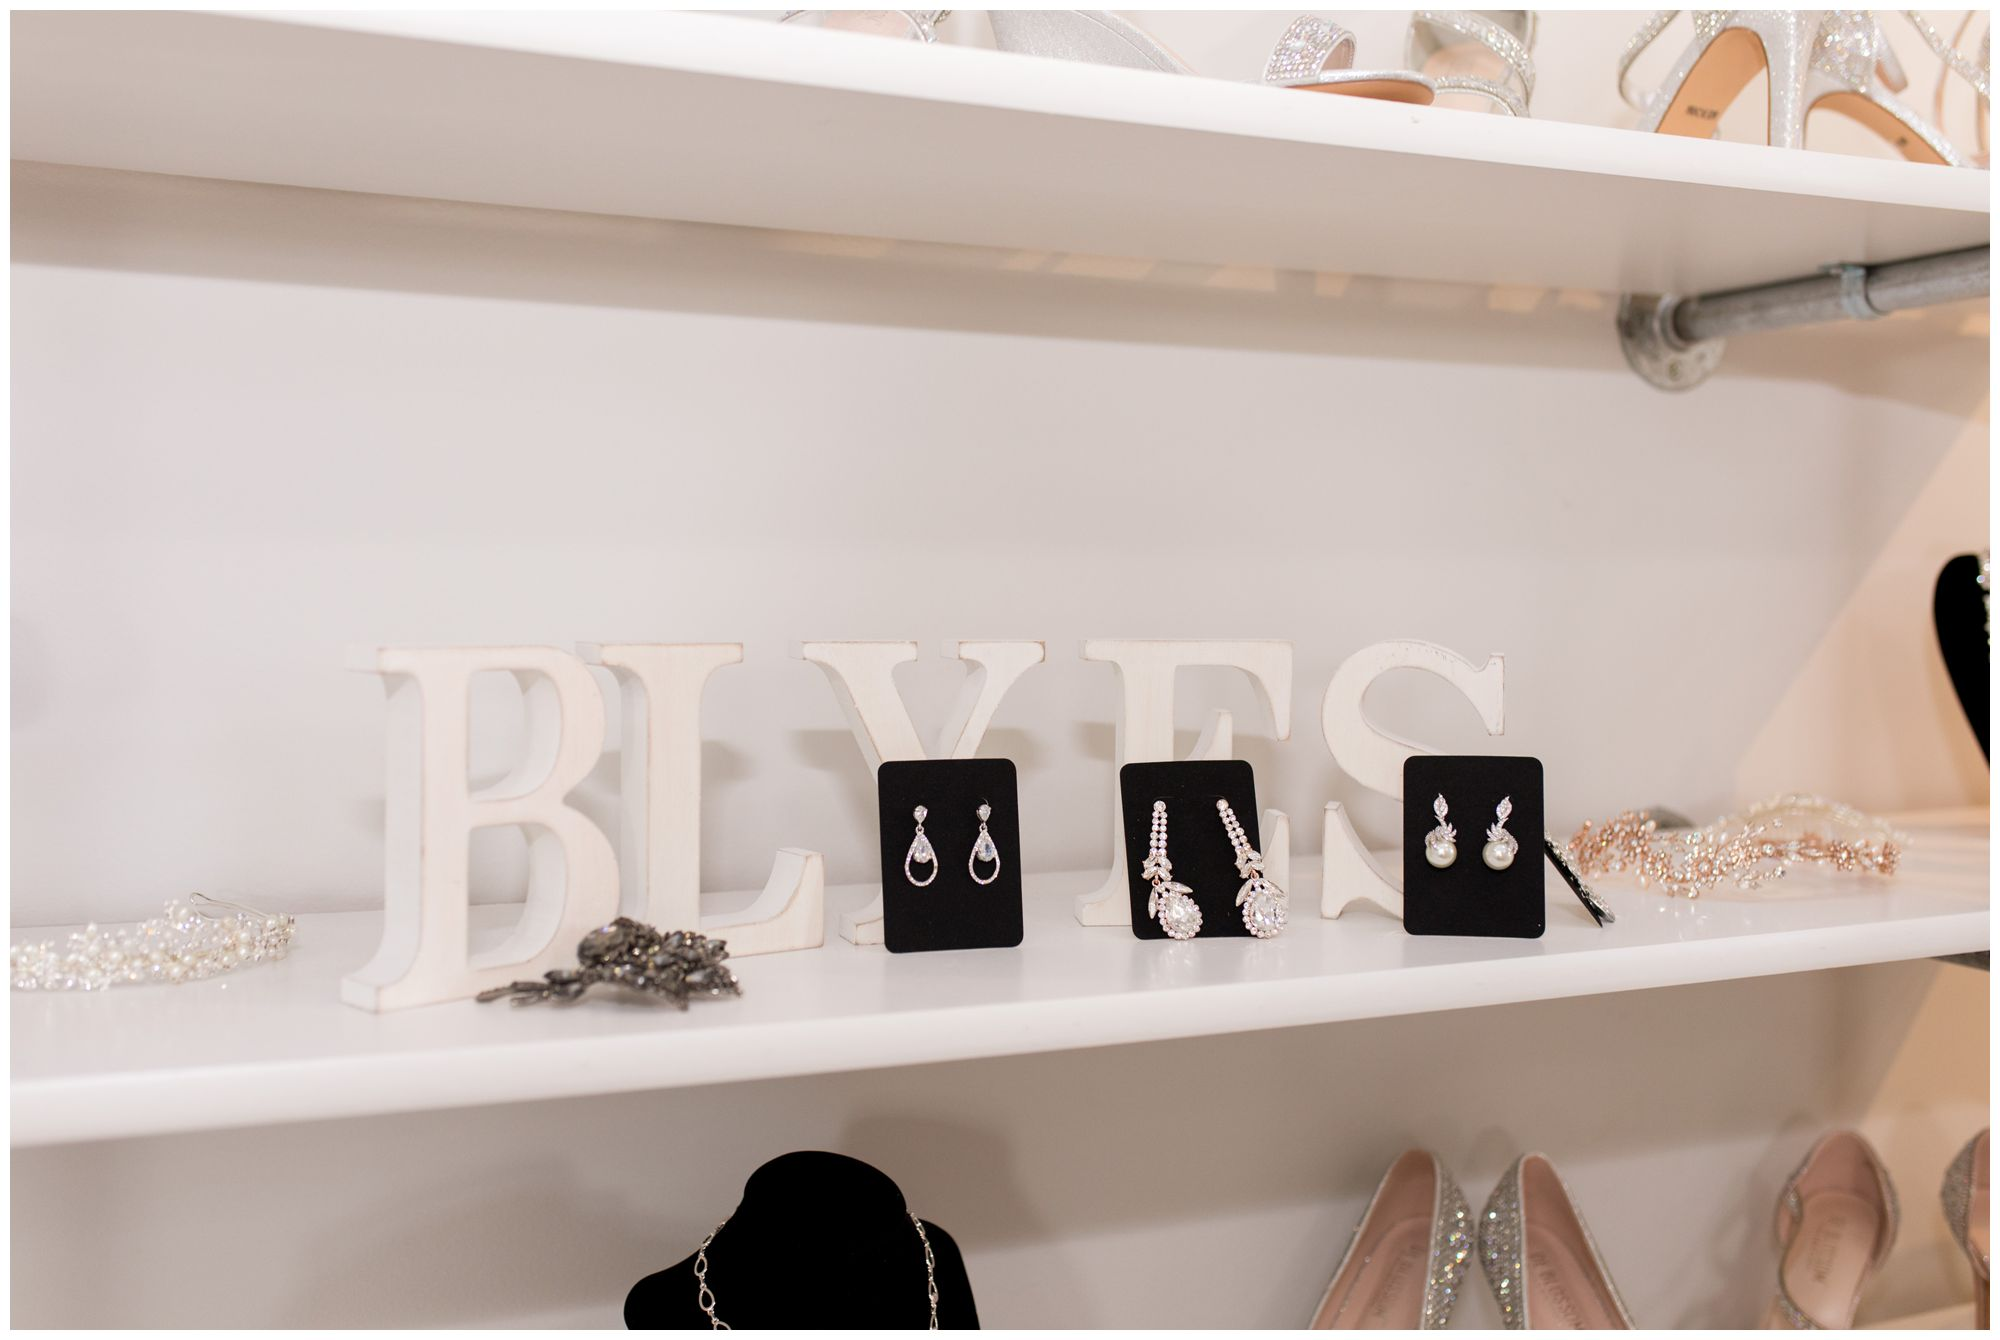 Blye's Bridal accessories